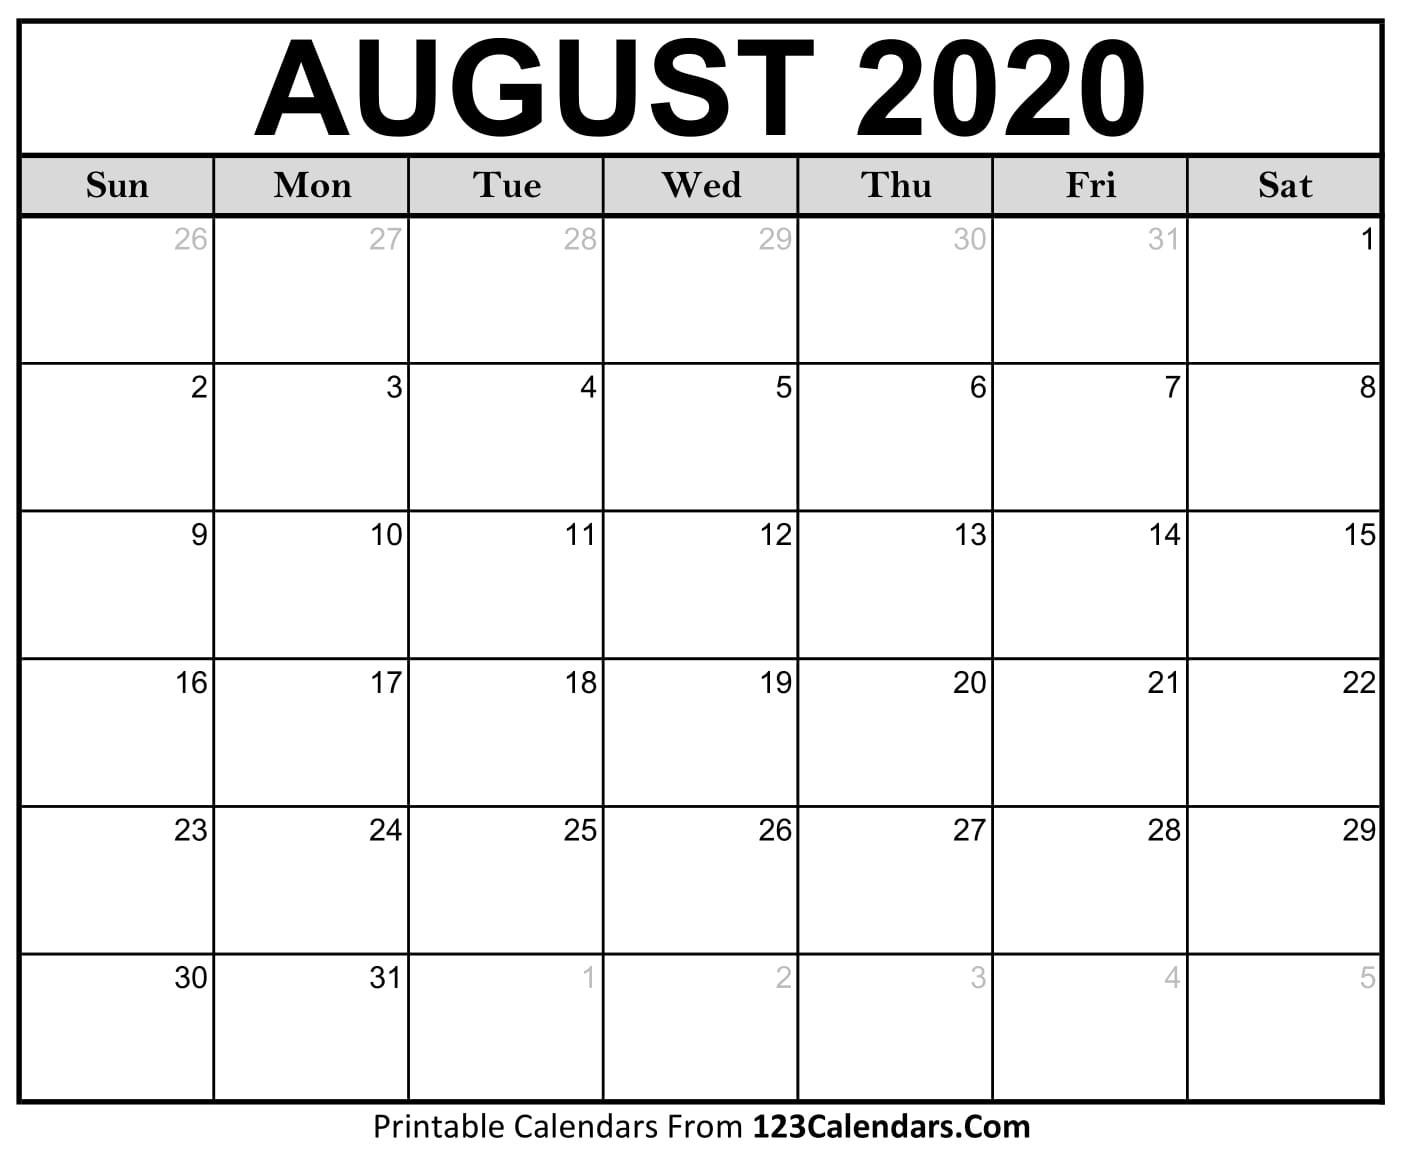 August 2020 Printable Calendar | 123Calendars-Monthly Calendar June July August 2020